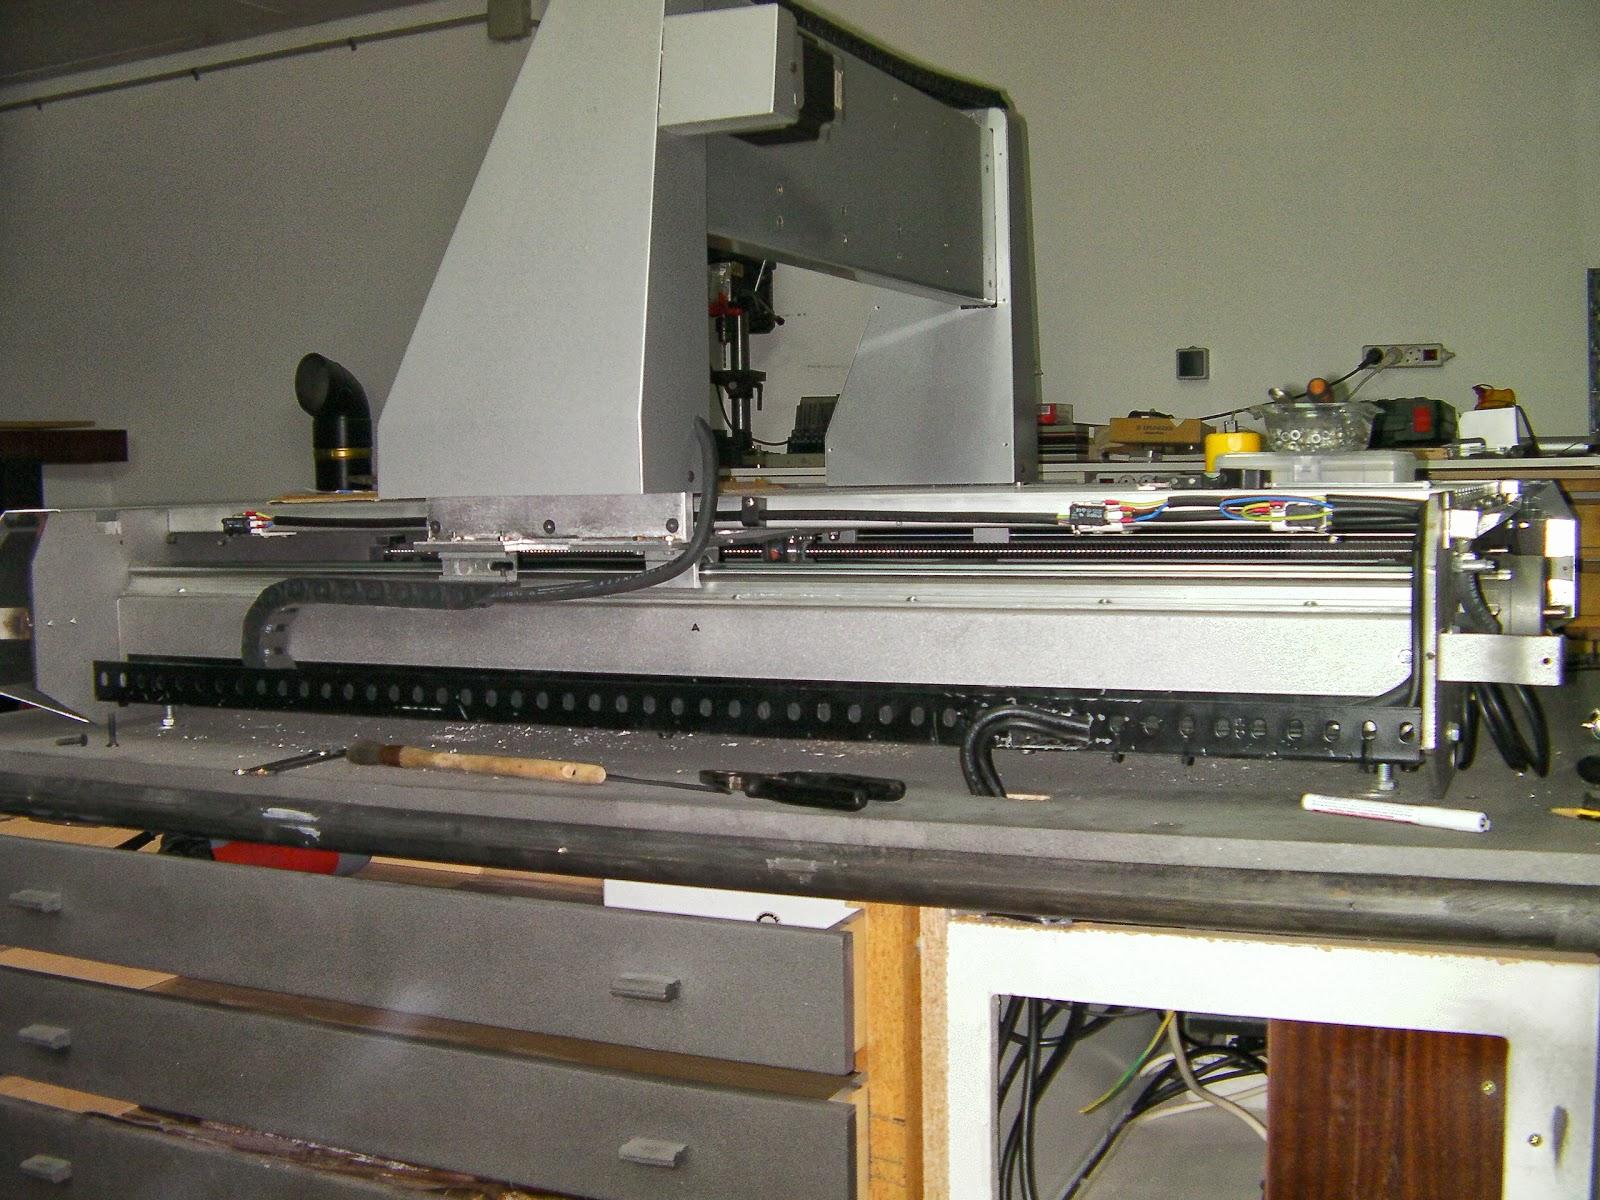 Fresadora cnc 4 ejes casera router 4 parte - Como camuflar cables ...